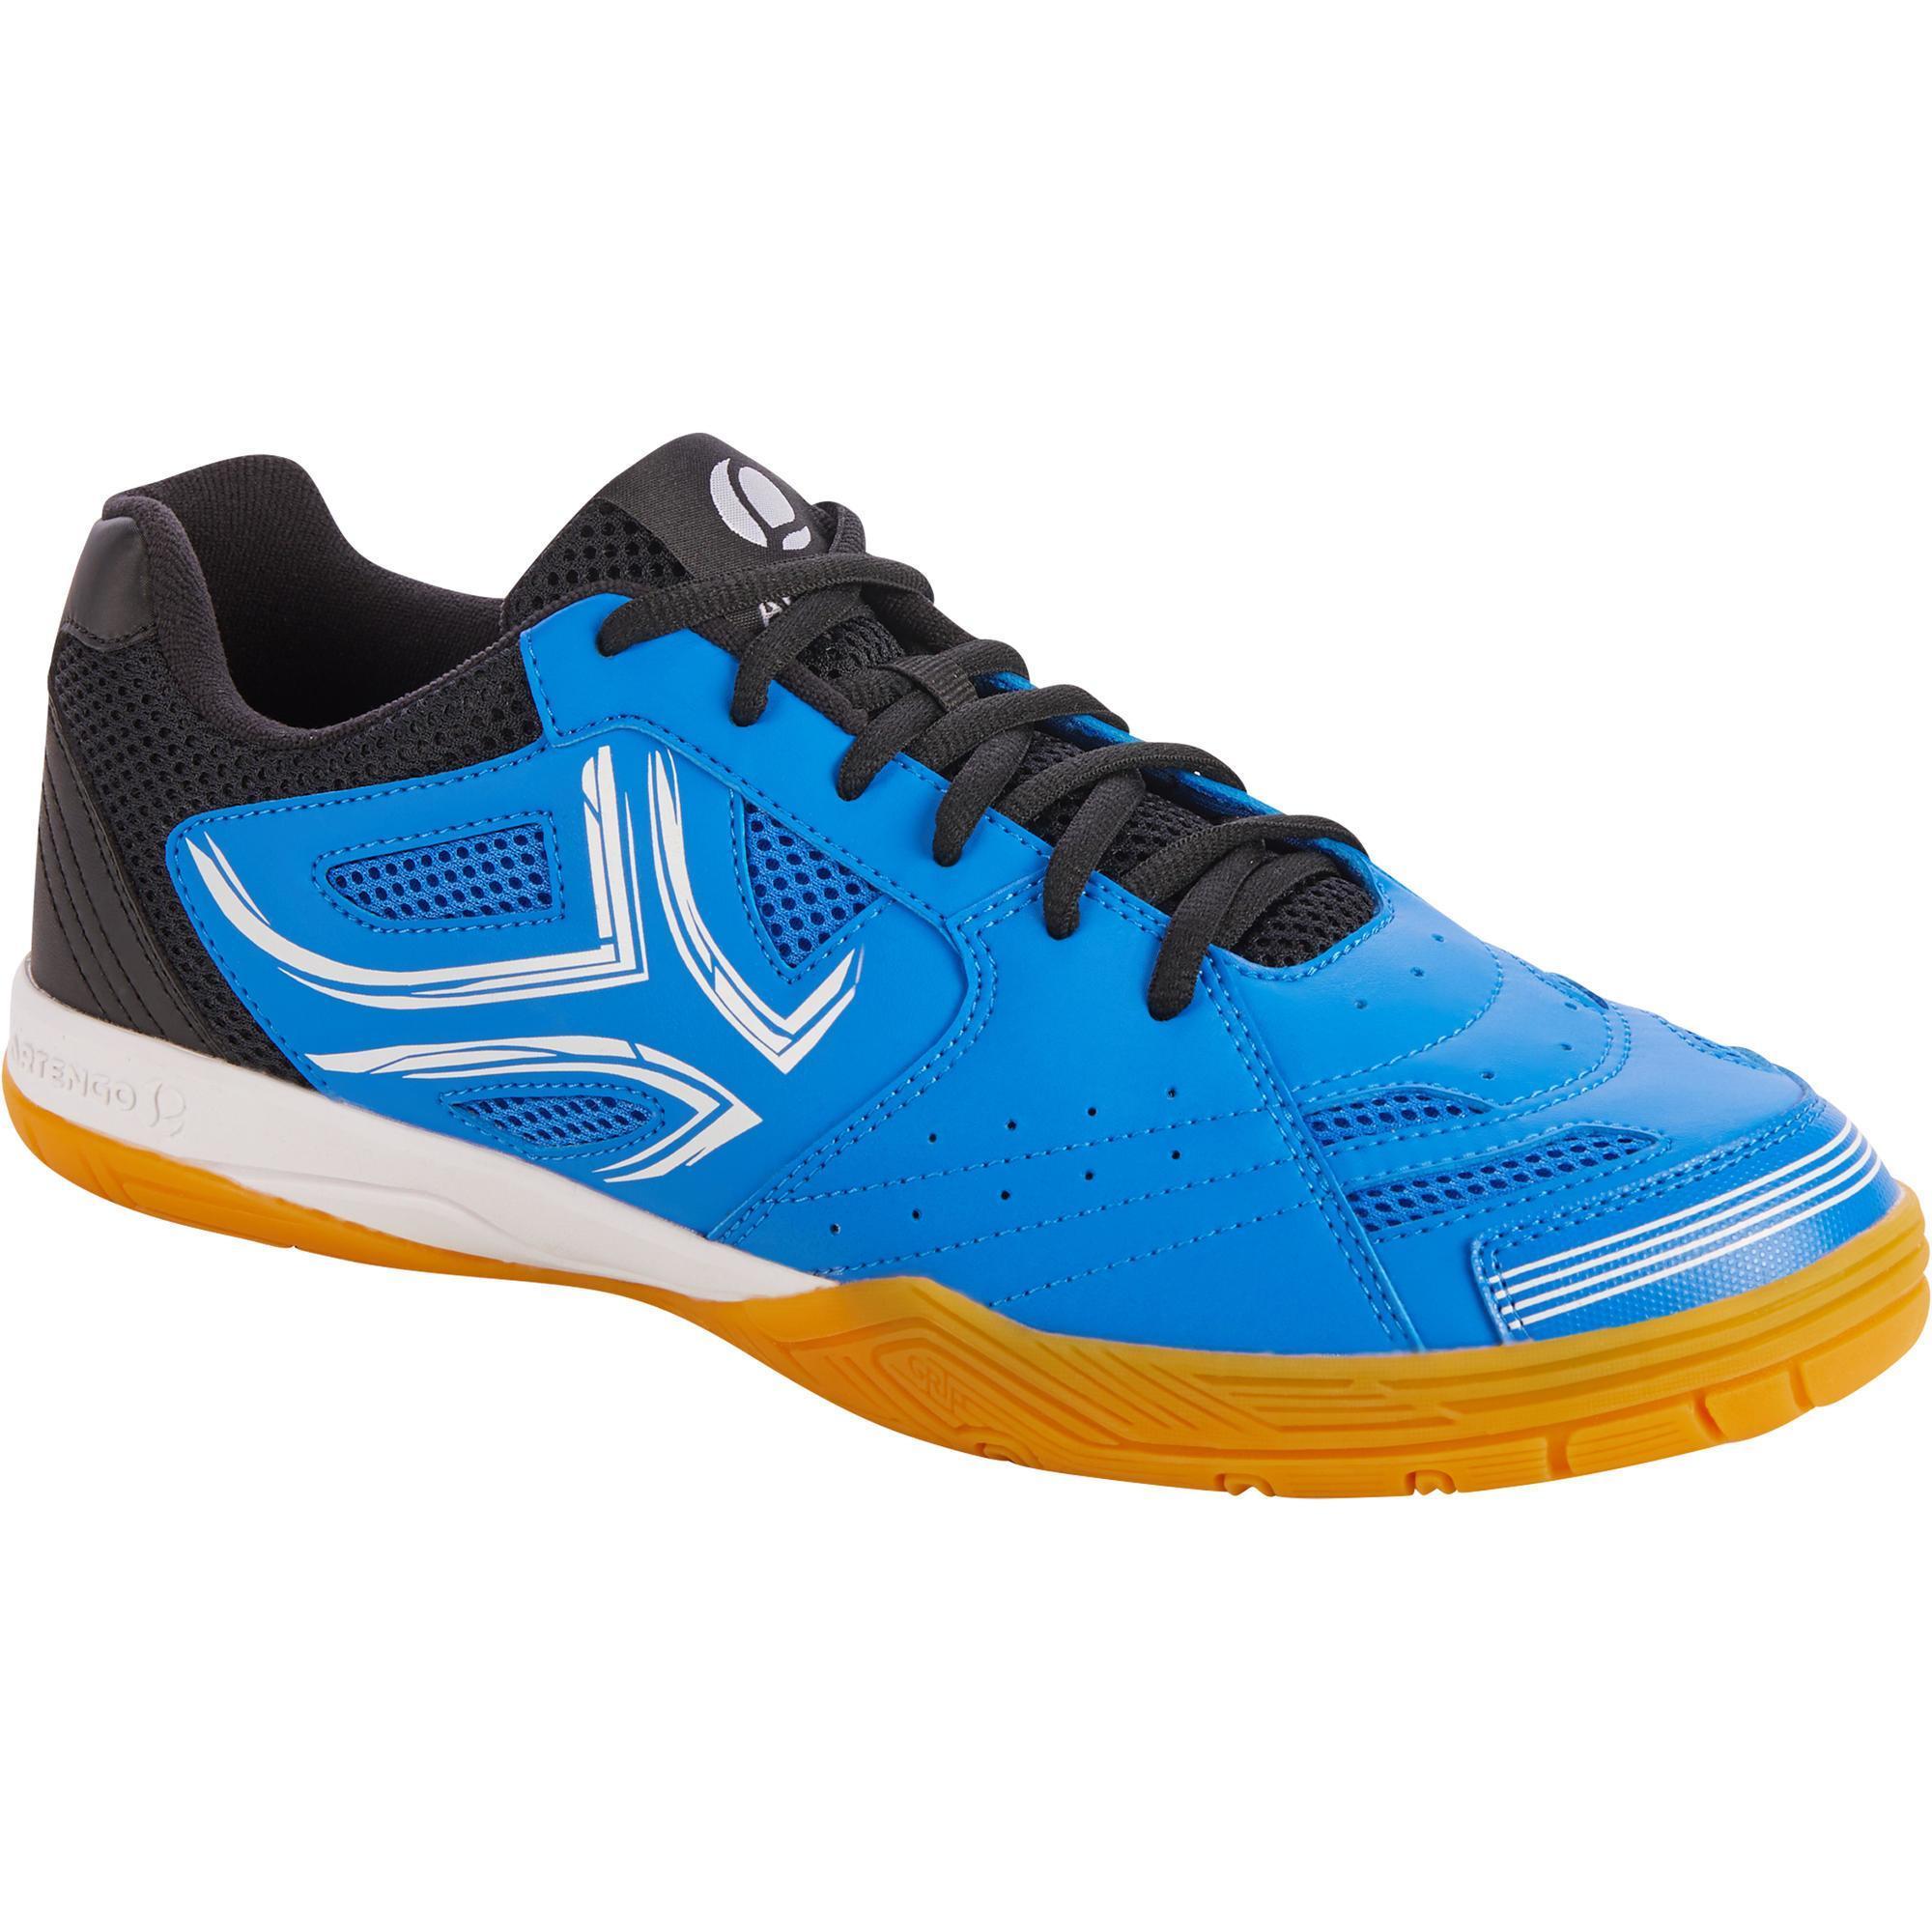 Artengo Tafeltennisschoenen TTS 500 blauw